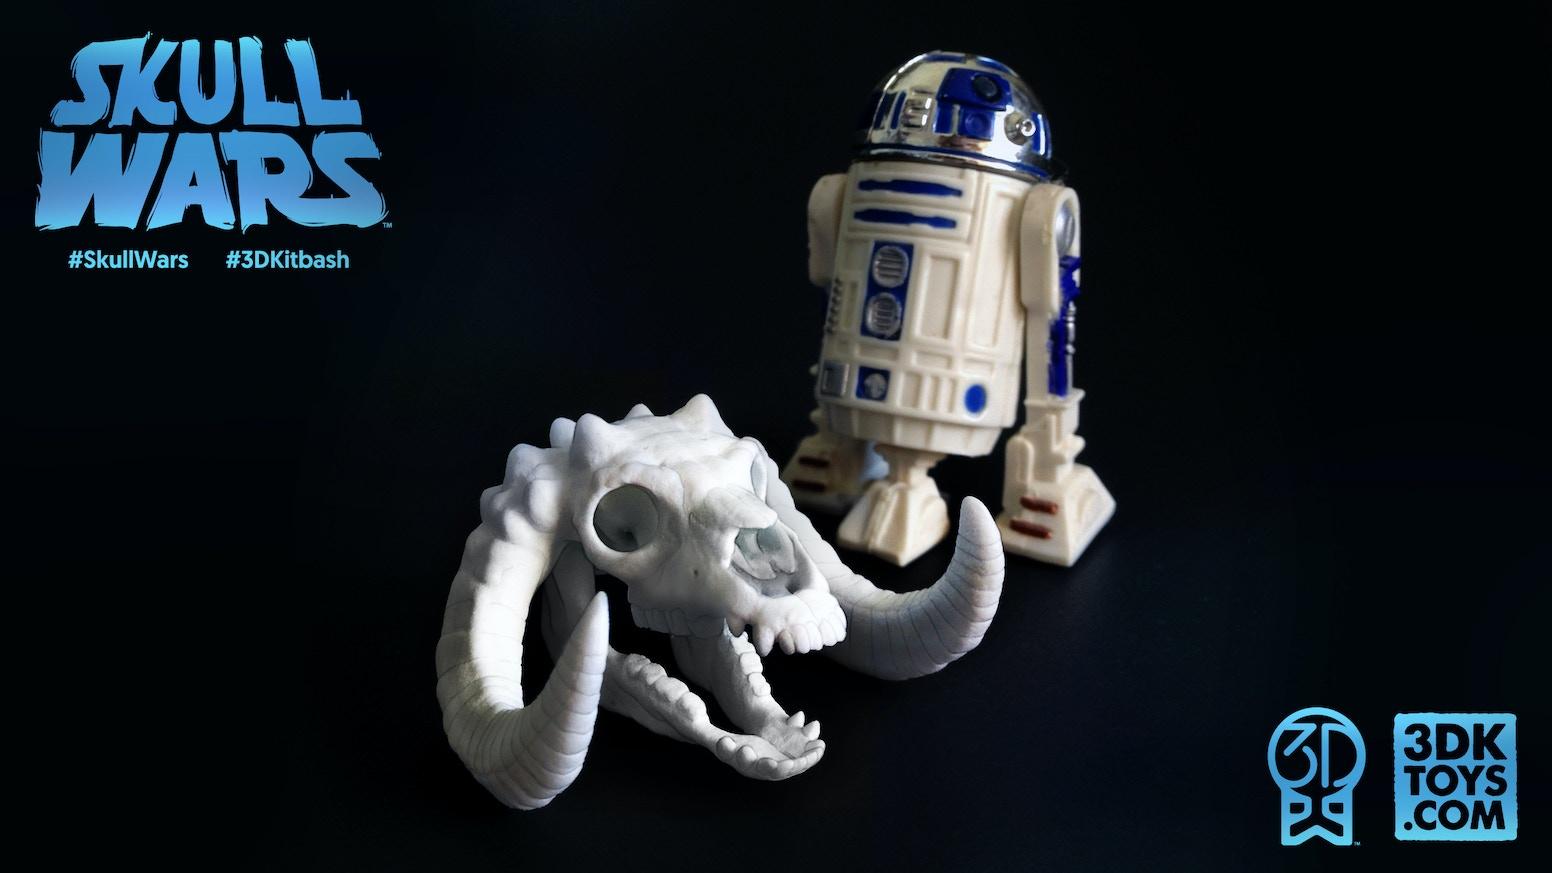 skull wars star wars parody skulls 3d printer levels too